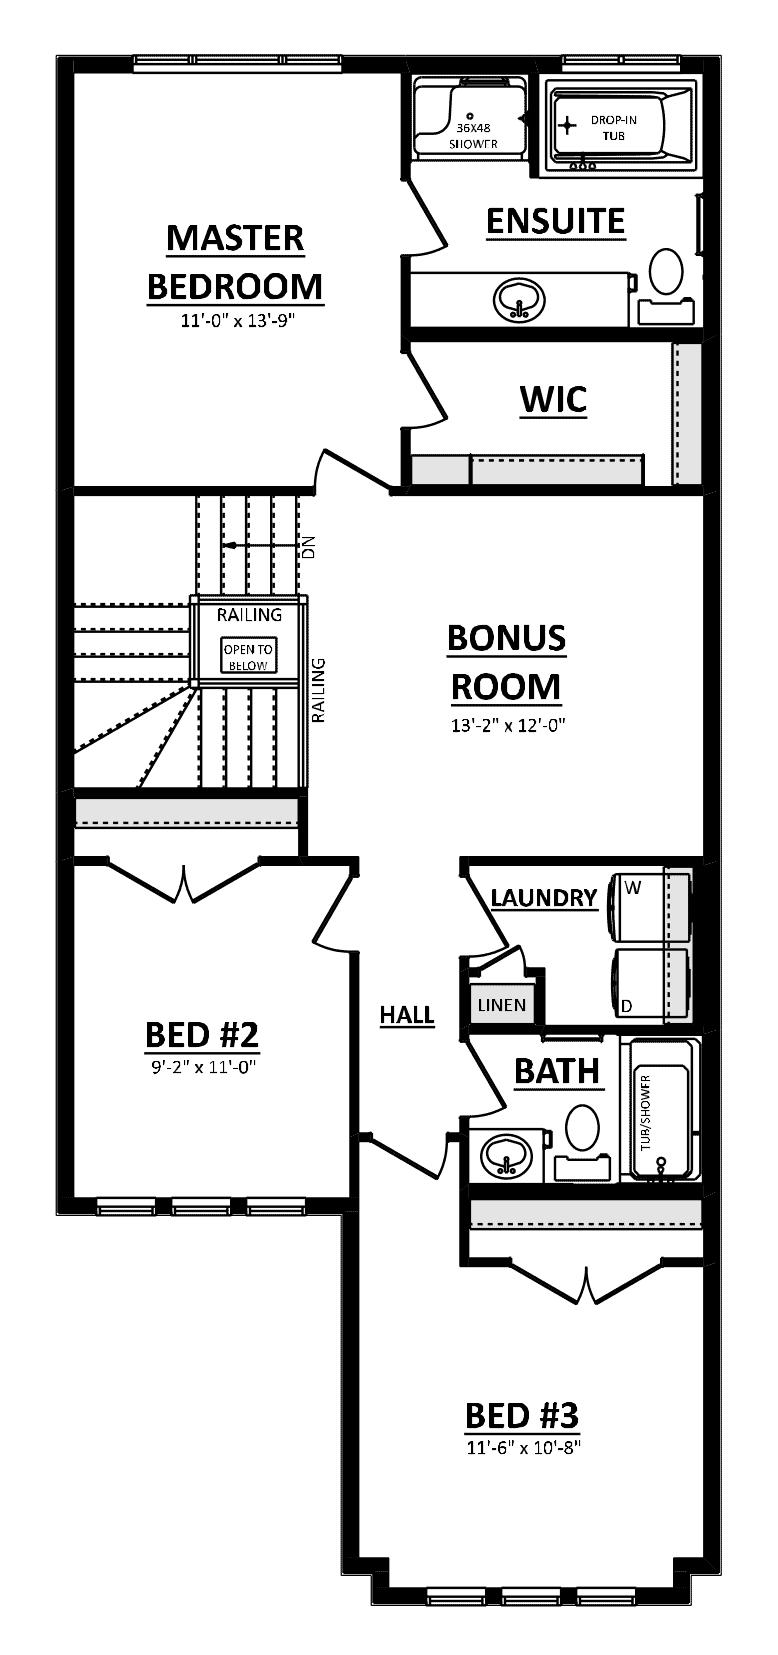 sophia b second floor 09 2021